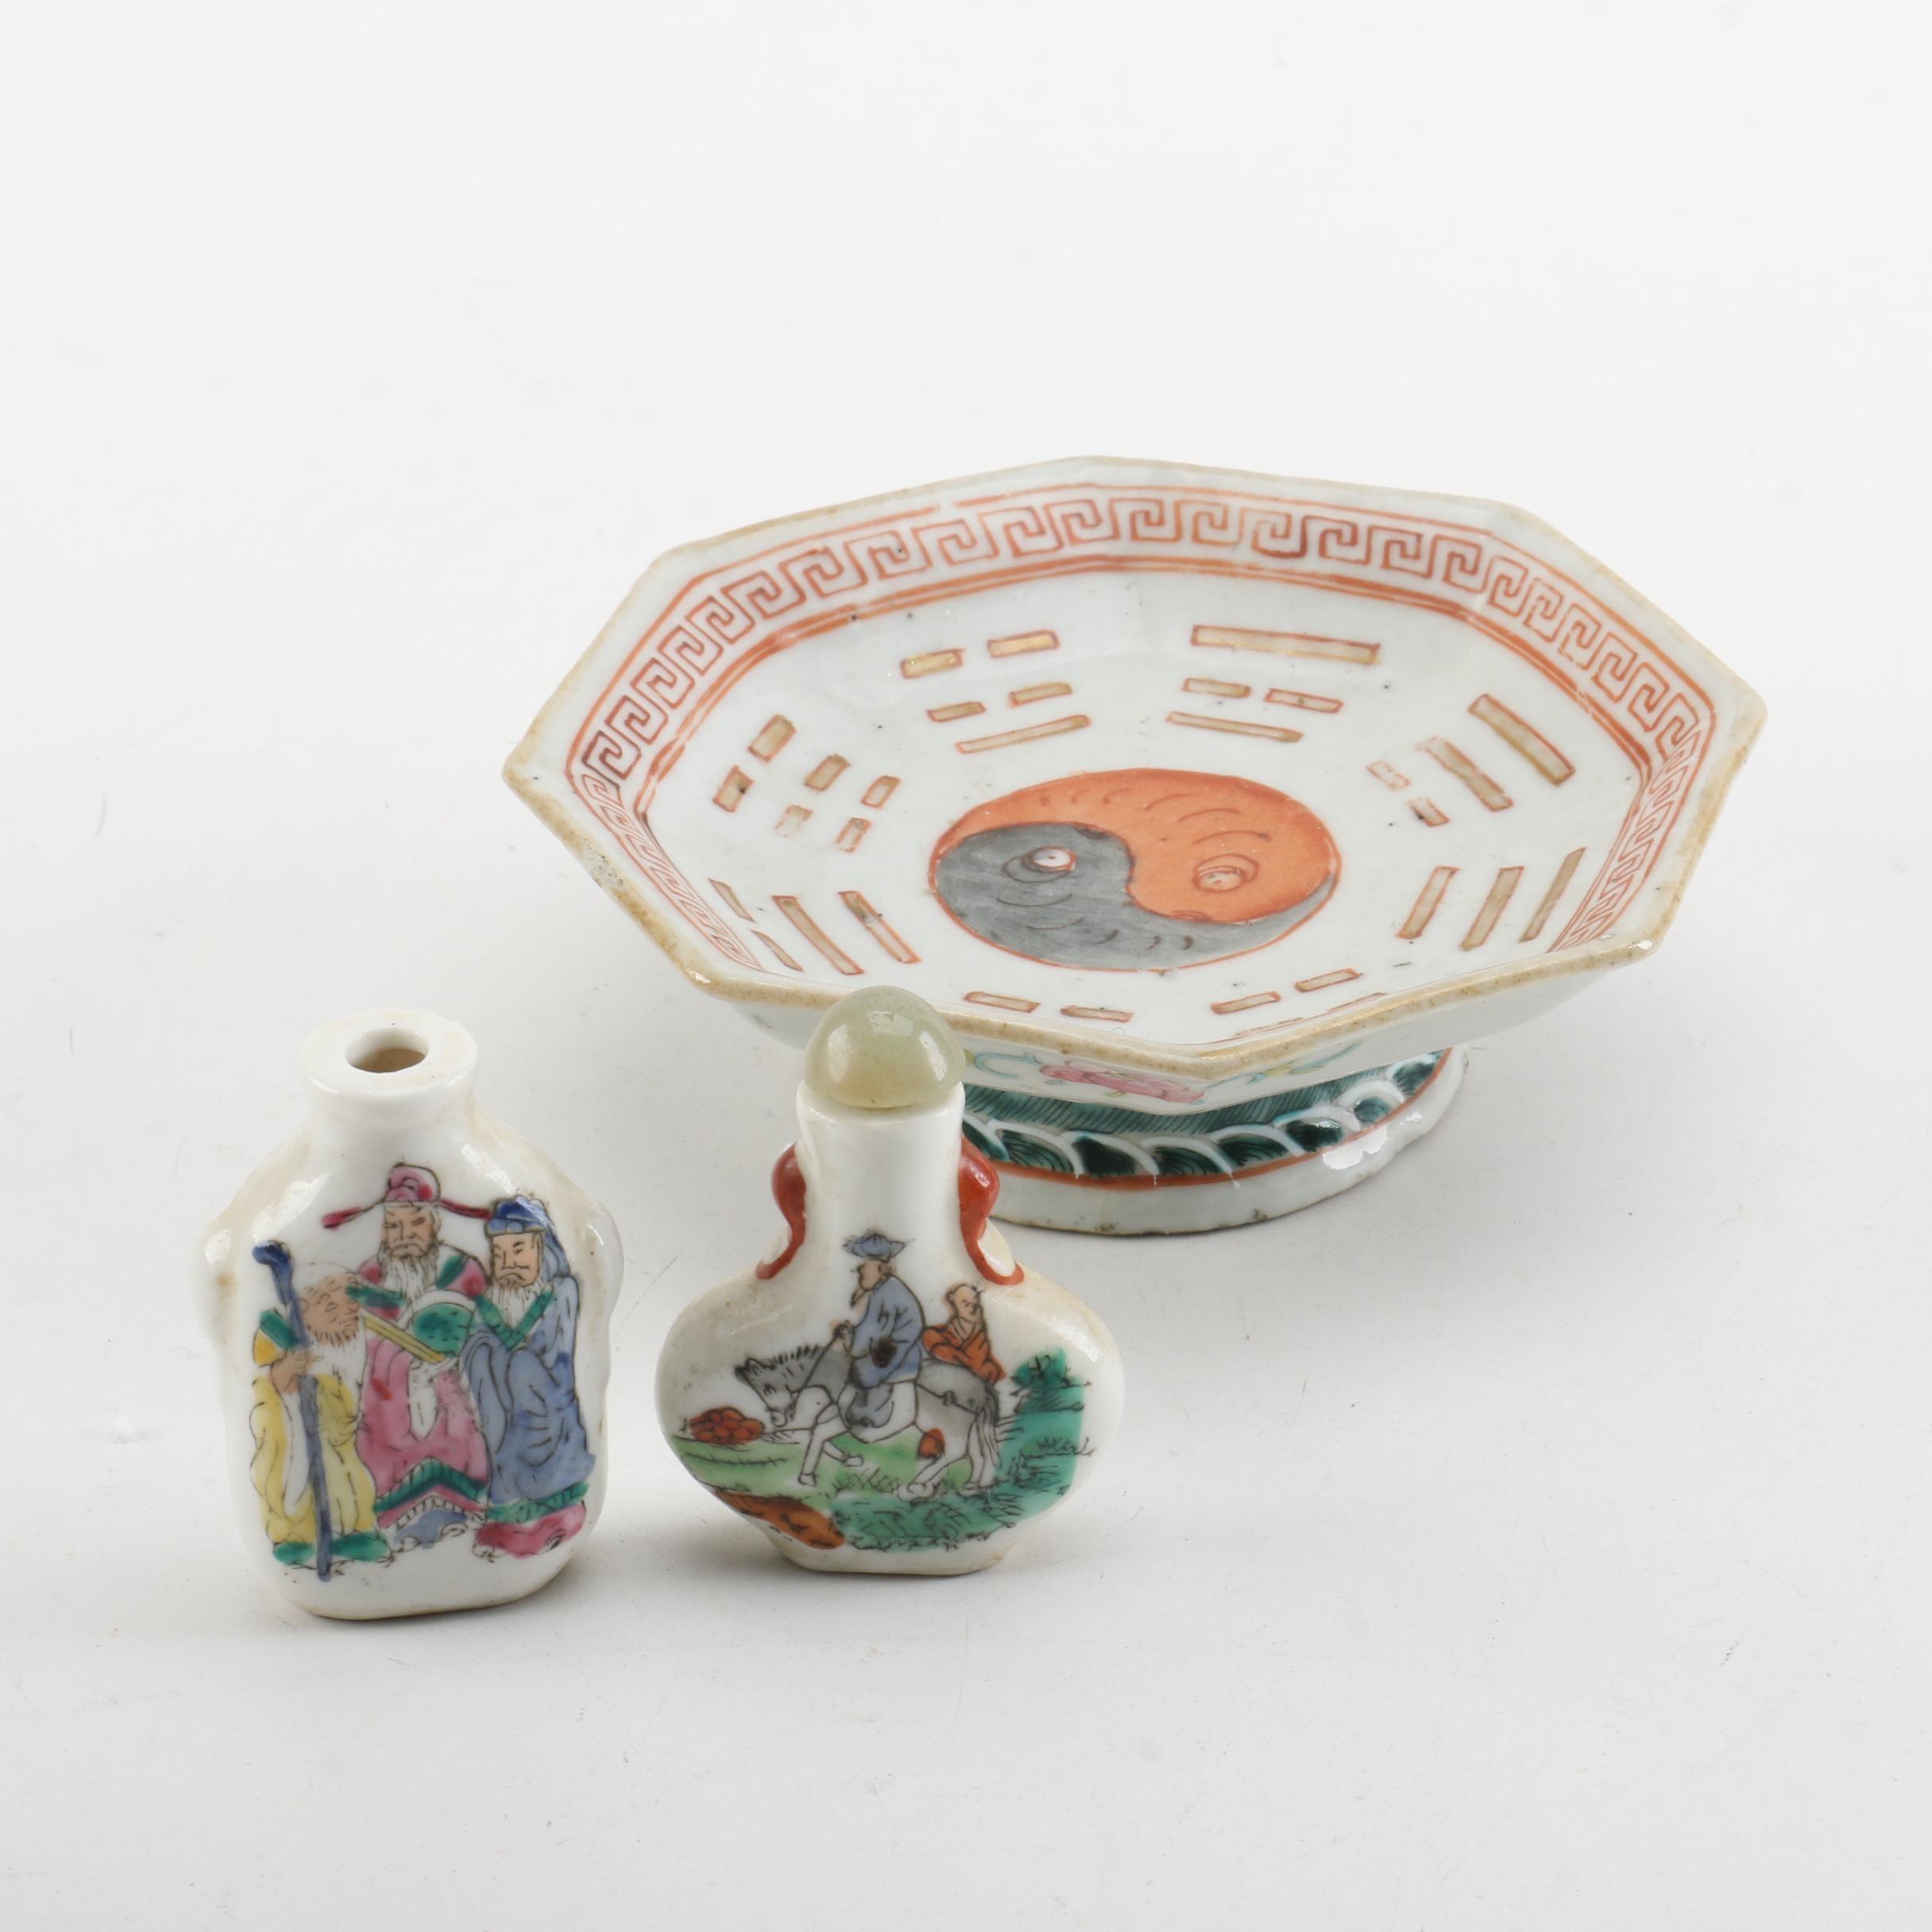 Chinese Snuff Bottles and Yin-Yang Pedestal Dish